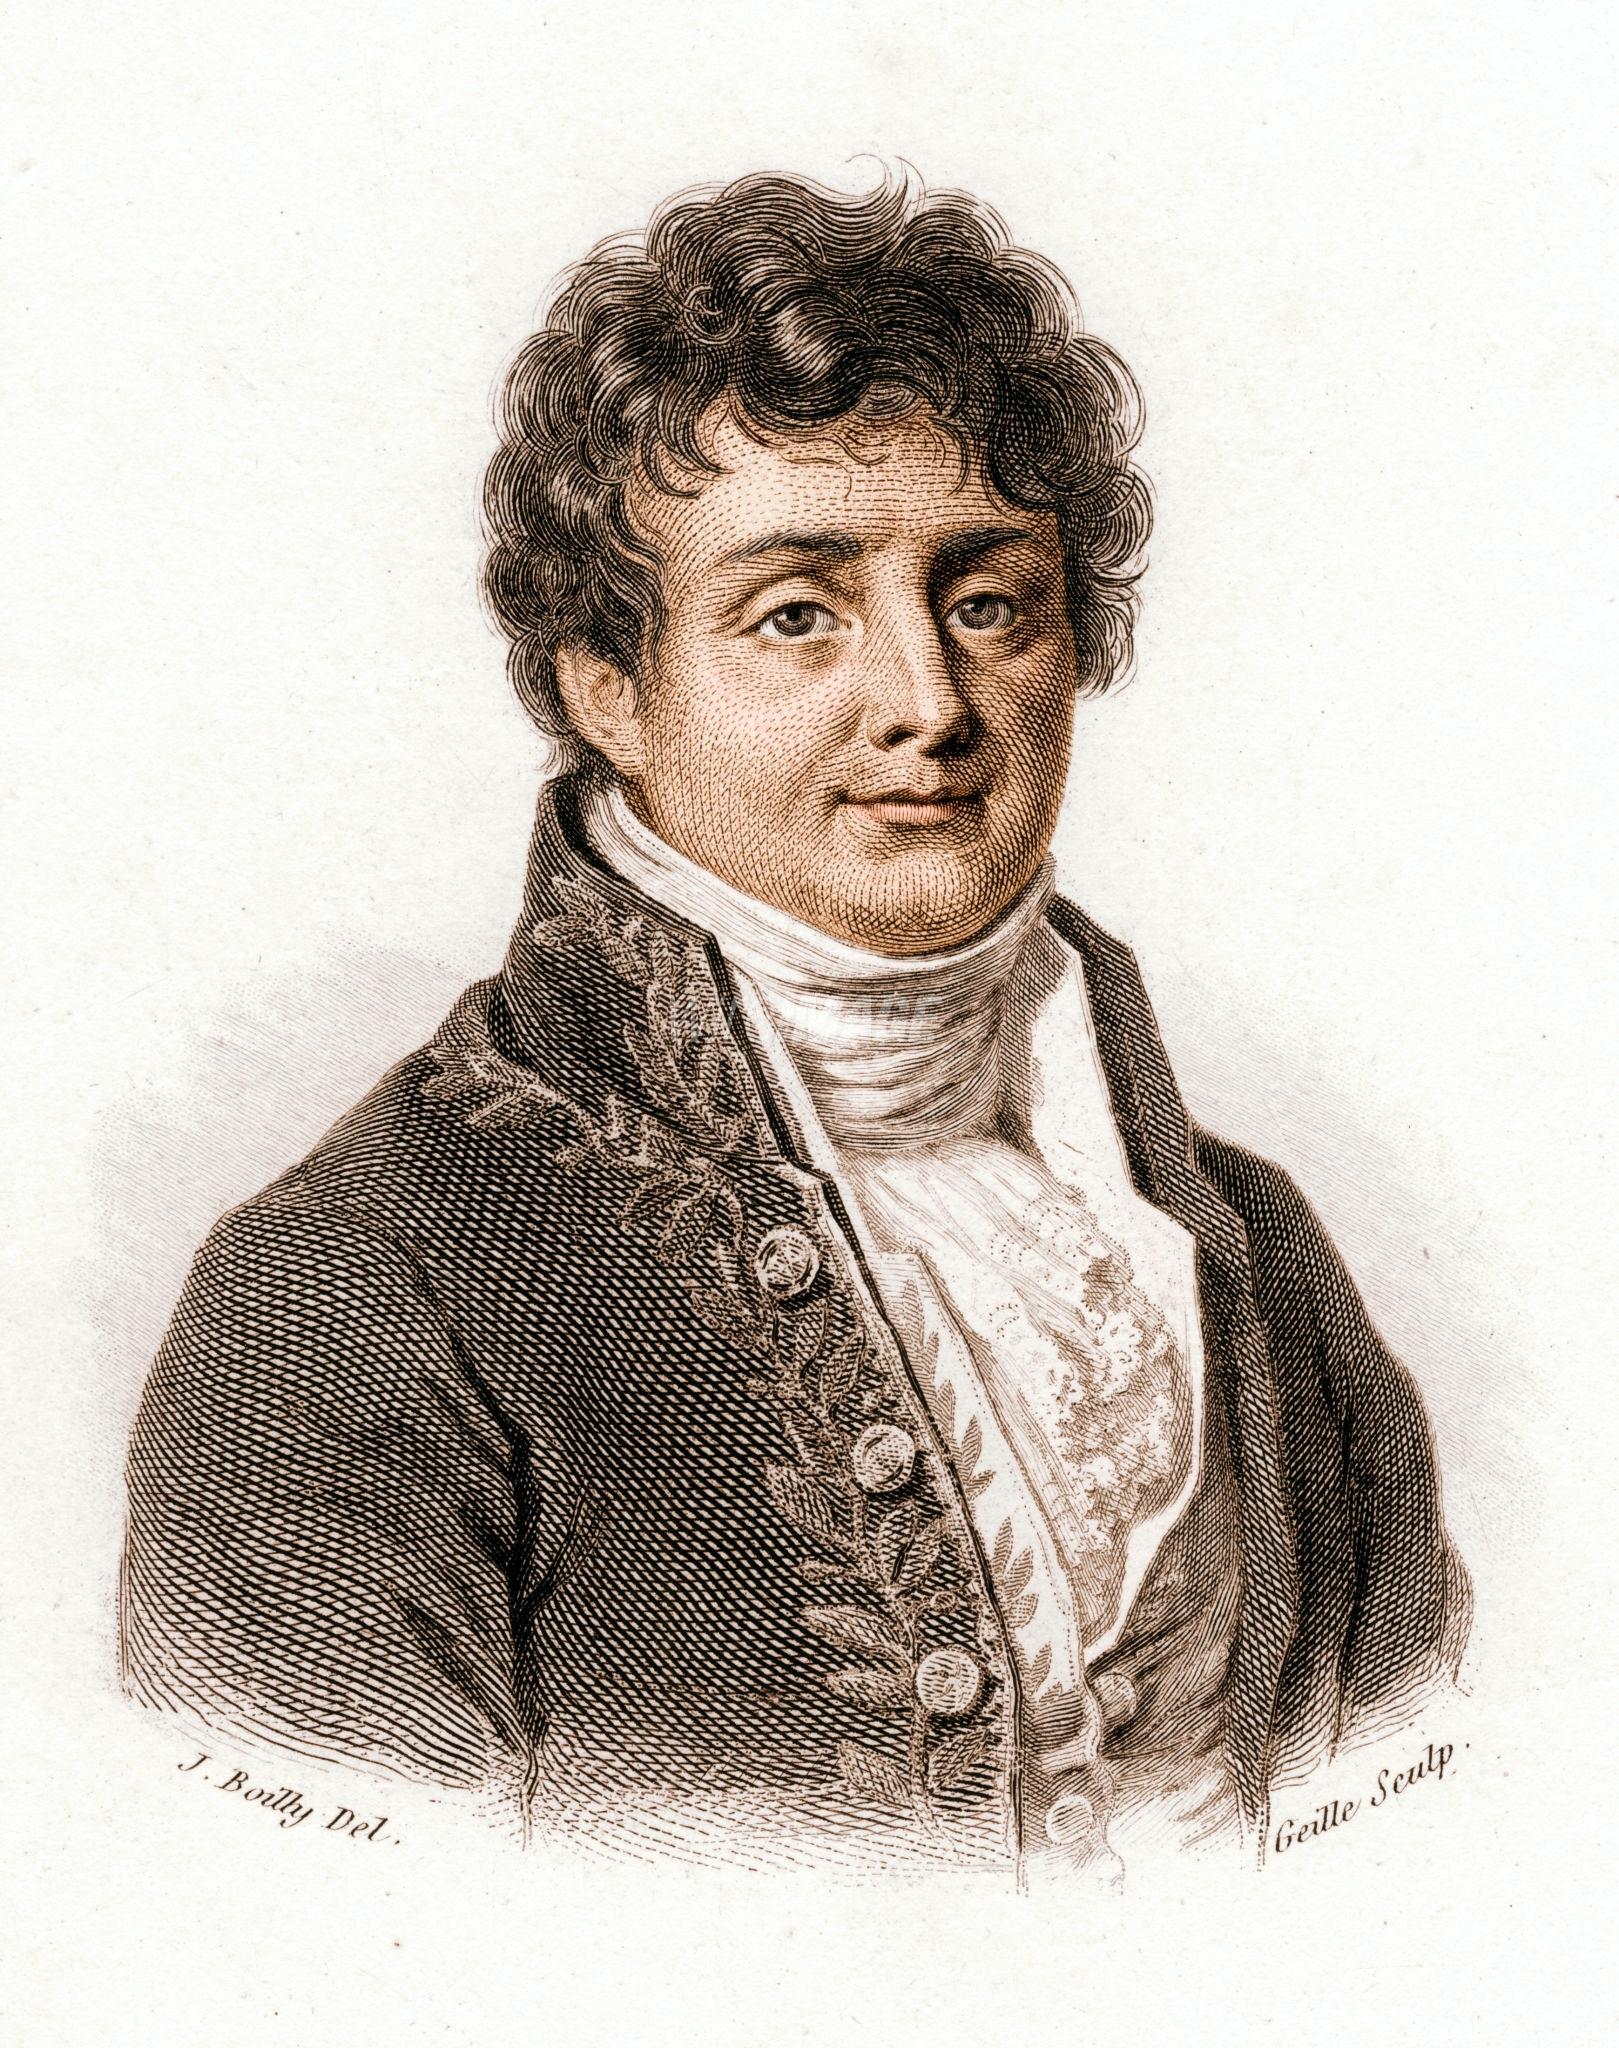 Joseph Fourier - Wikipedia